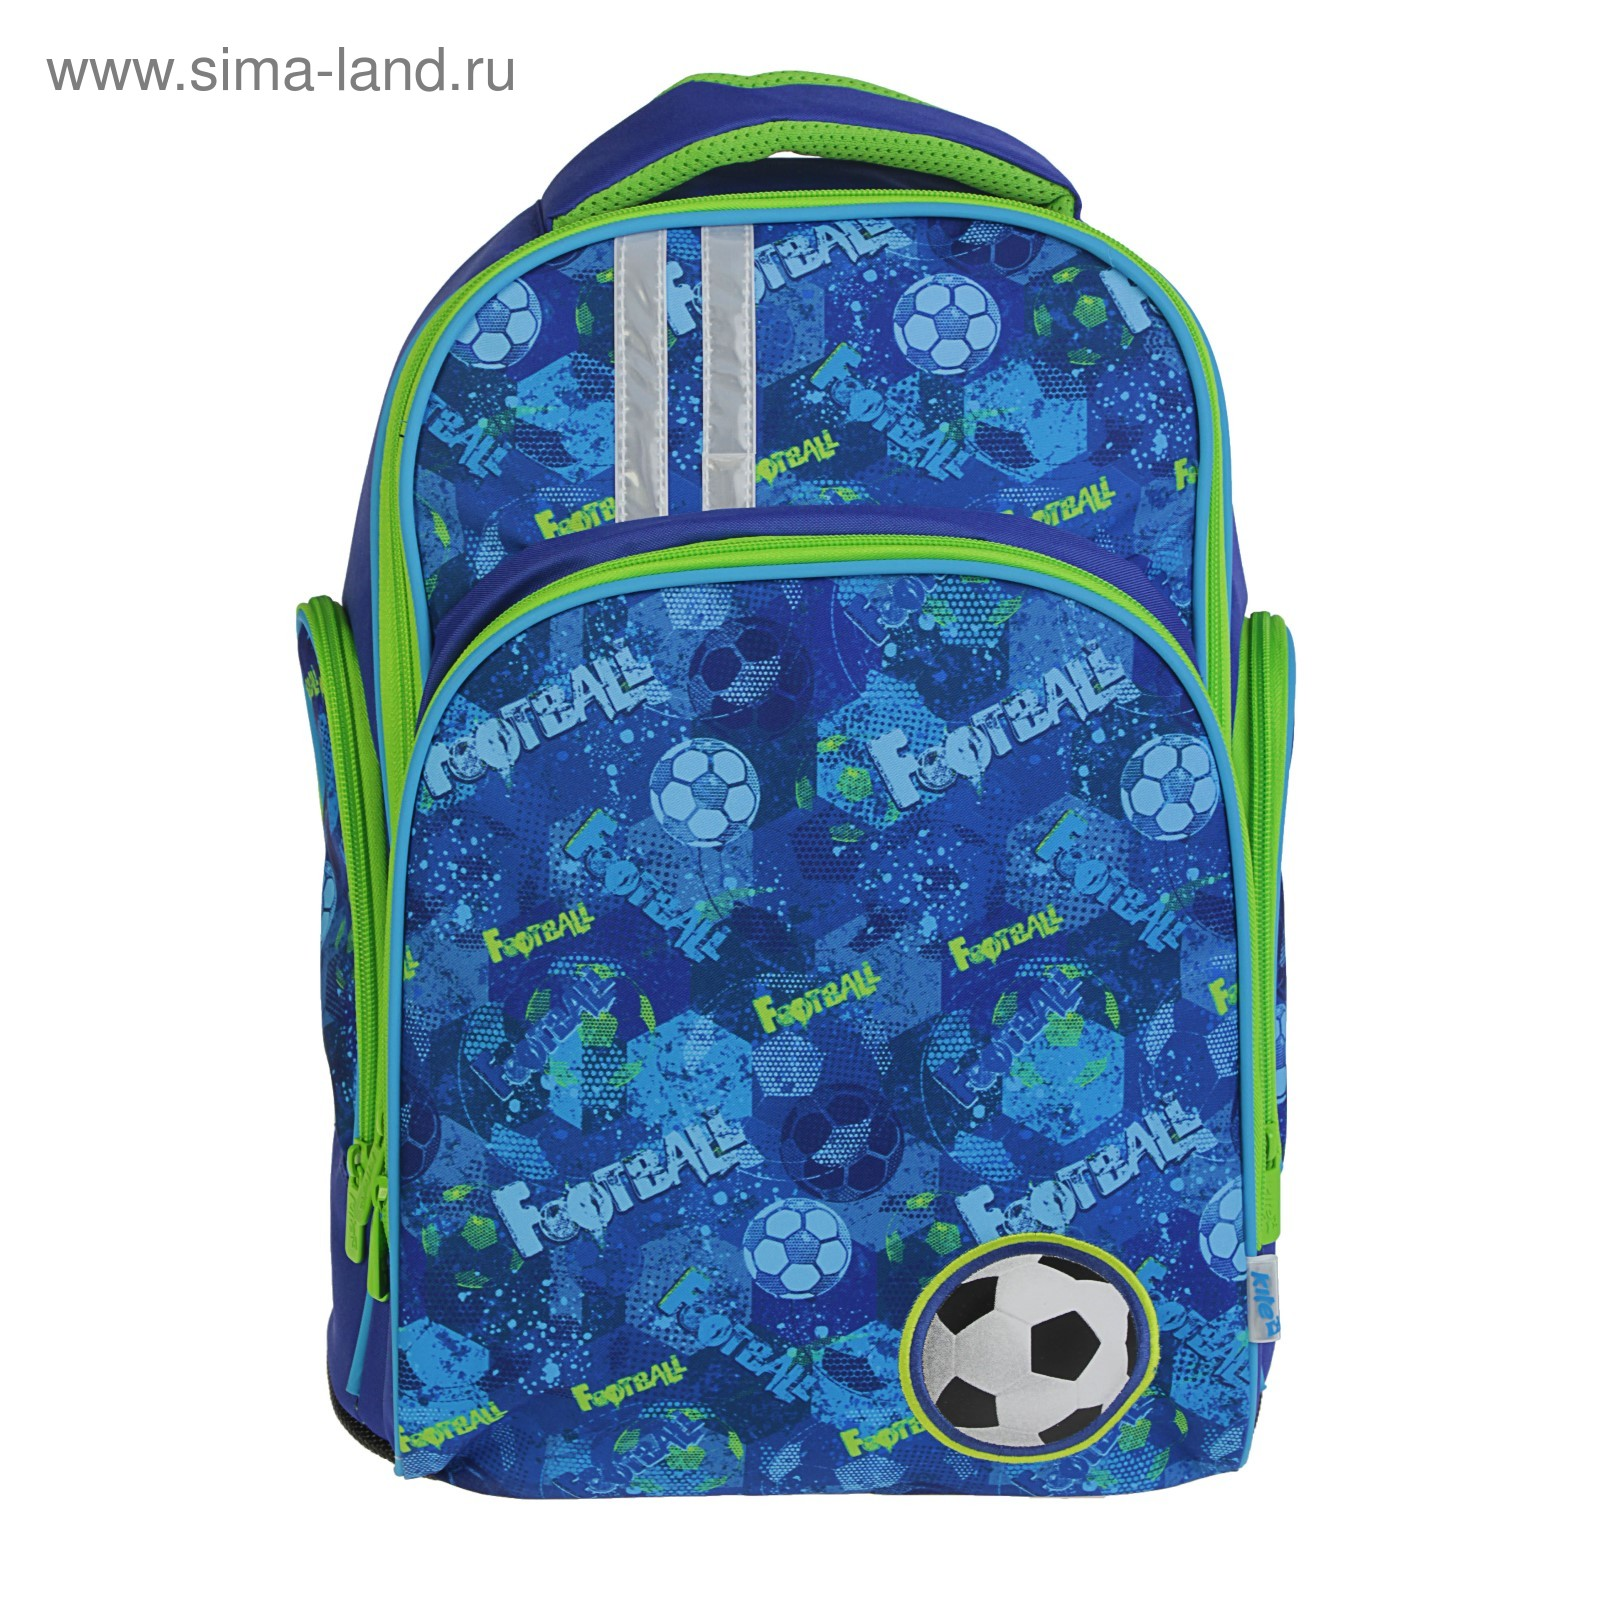 f8547434e798 Рюкзак школьный Kite 706 Football, 38 х 29 х 16 см, синий (K18-706M ...